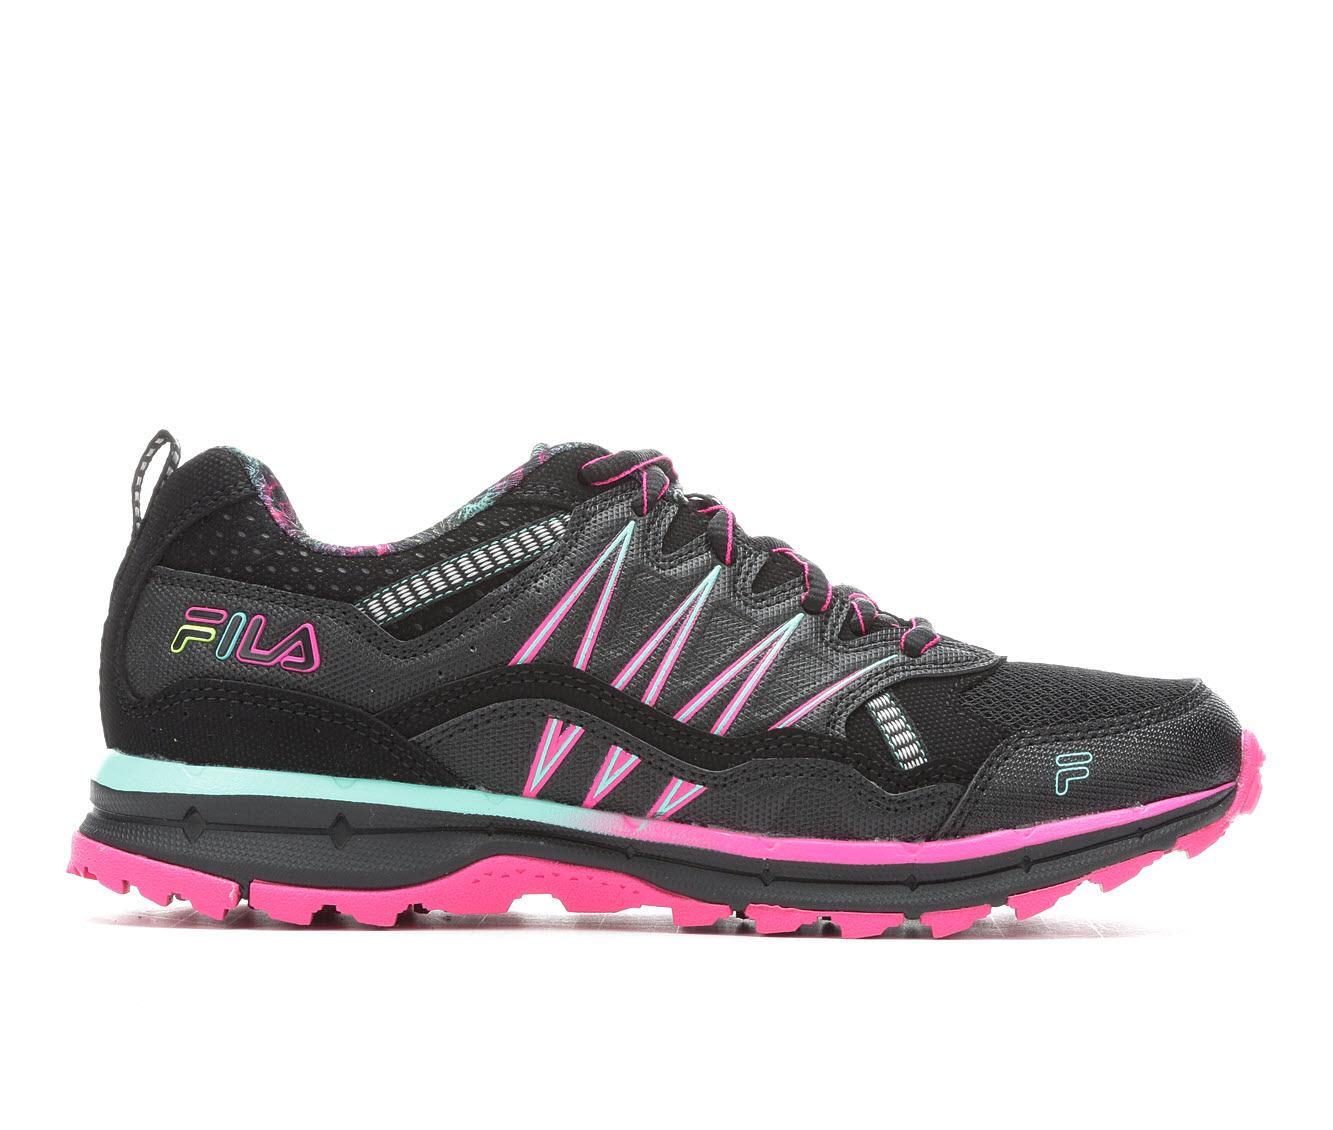 Fila Evergrand TR Evo Women's Athletic Shoe (Black)